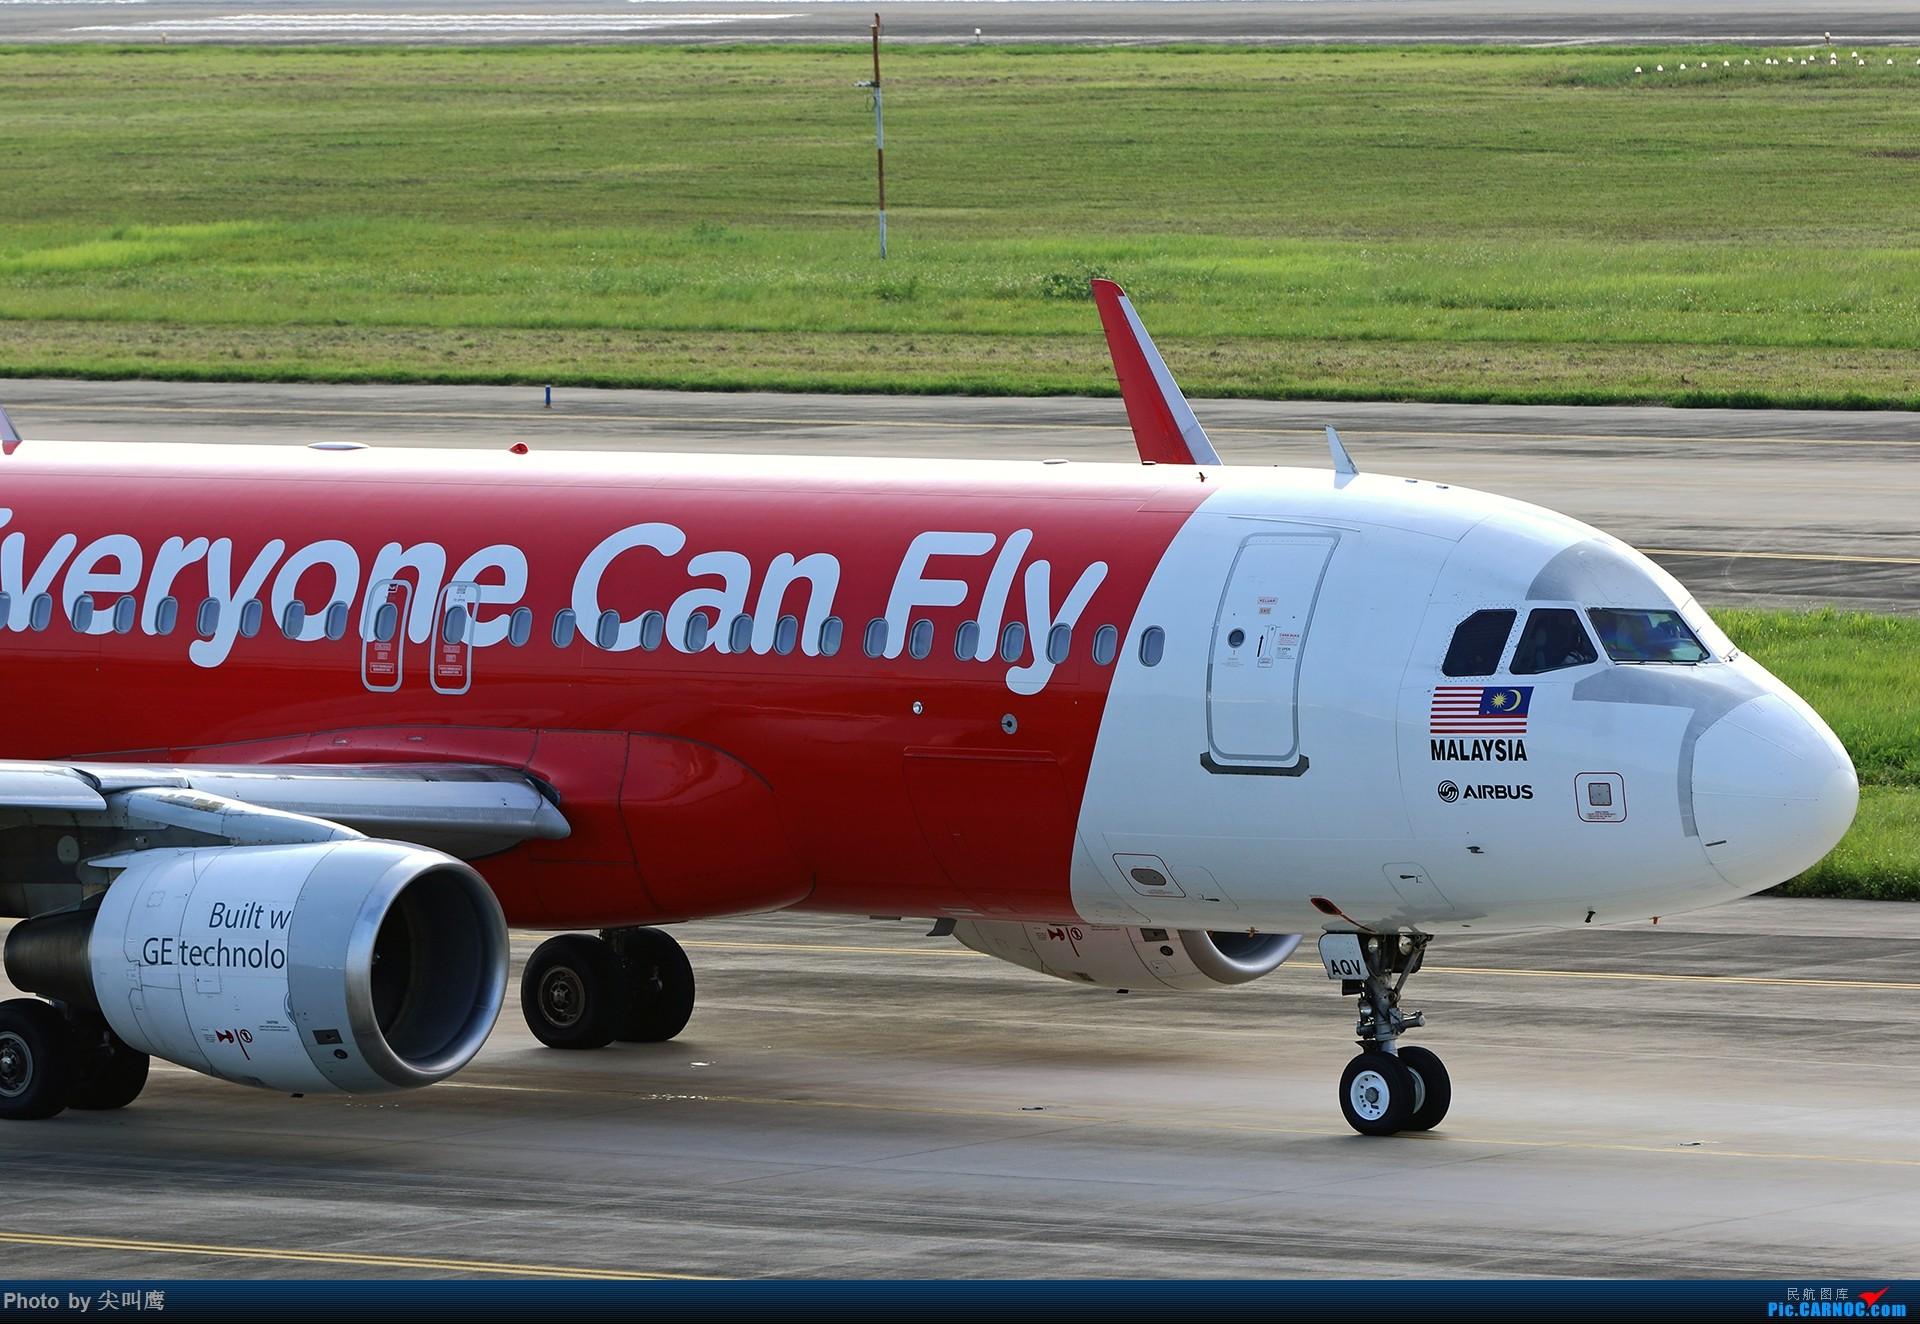 Re:[原创]NNG的亚航小合集 AIRBUS A320 9M-AQV 中国南宁吴圩国际机场